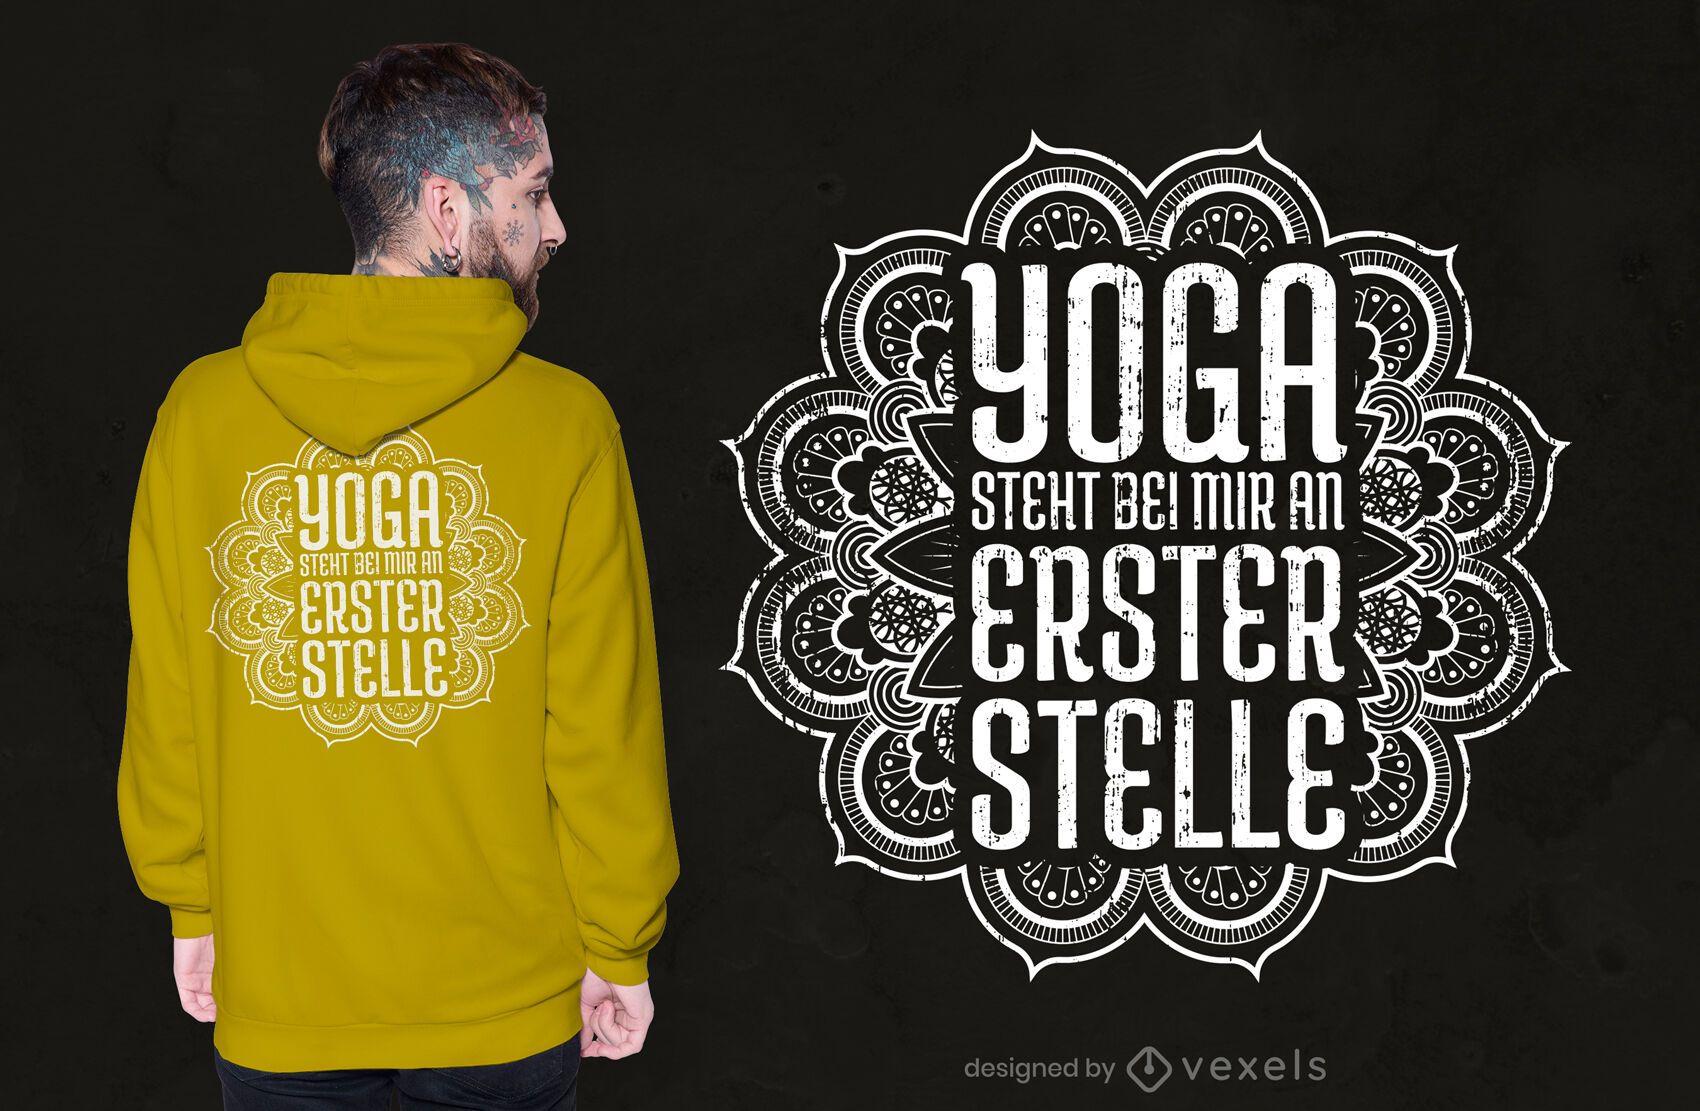 Yoga Deutsch Zitat T-Shirt Design